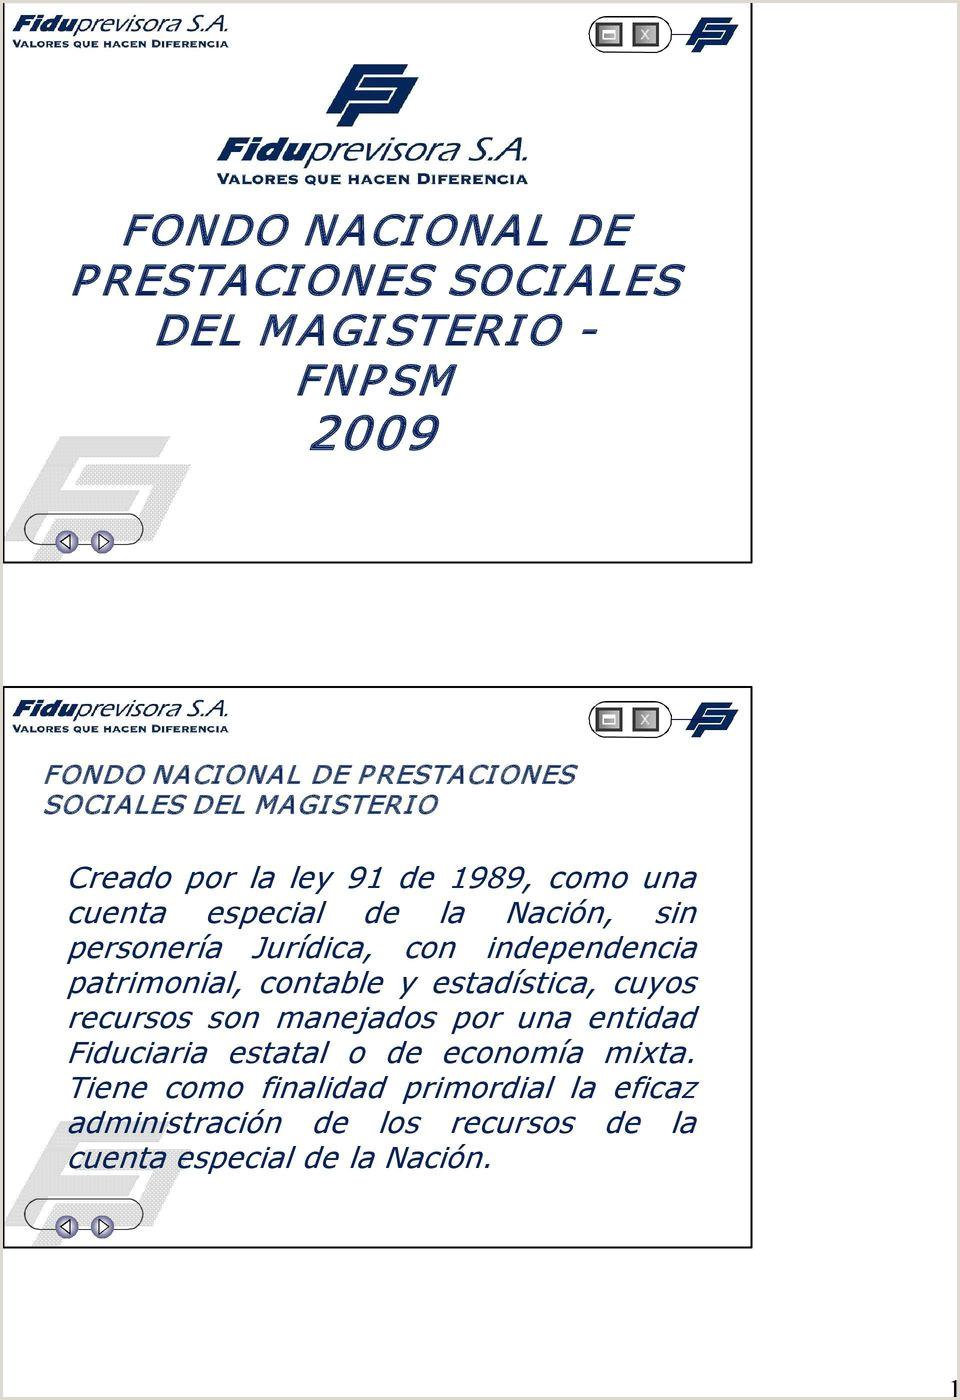 FONDO NACIONAL DE P RESTACIONES SOCIALES DEL MAGISTERIO FNP